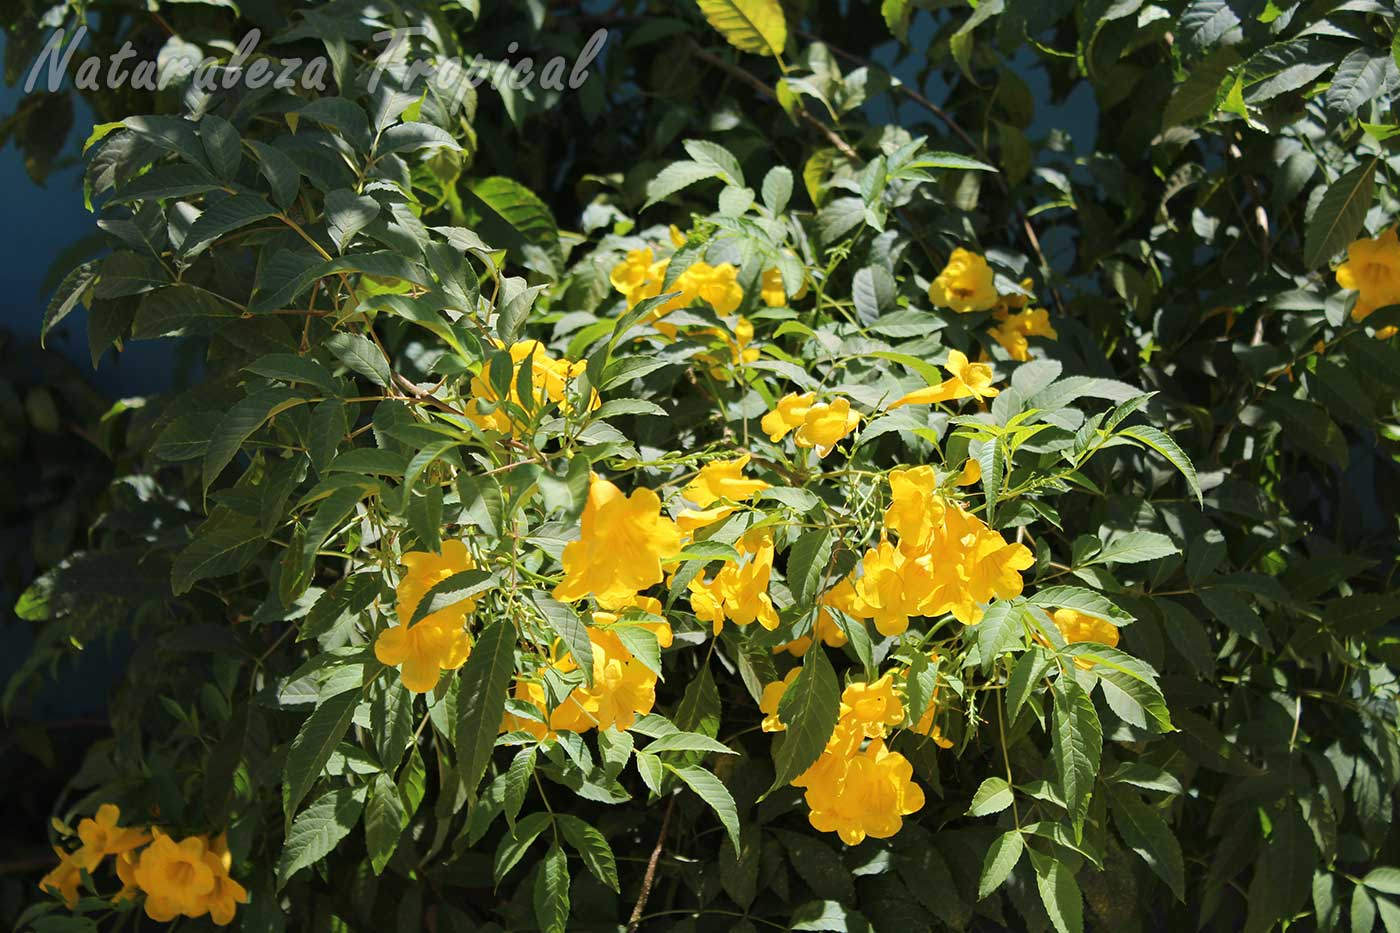 Vista del arbusto conocido como Bignonia amarilla, Tecoma stans